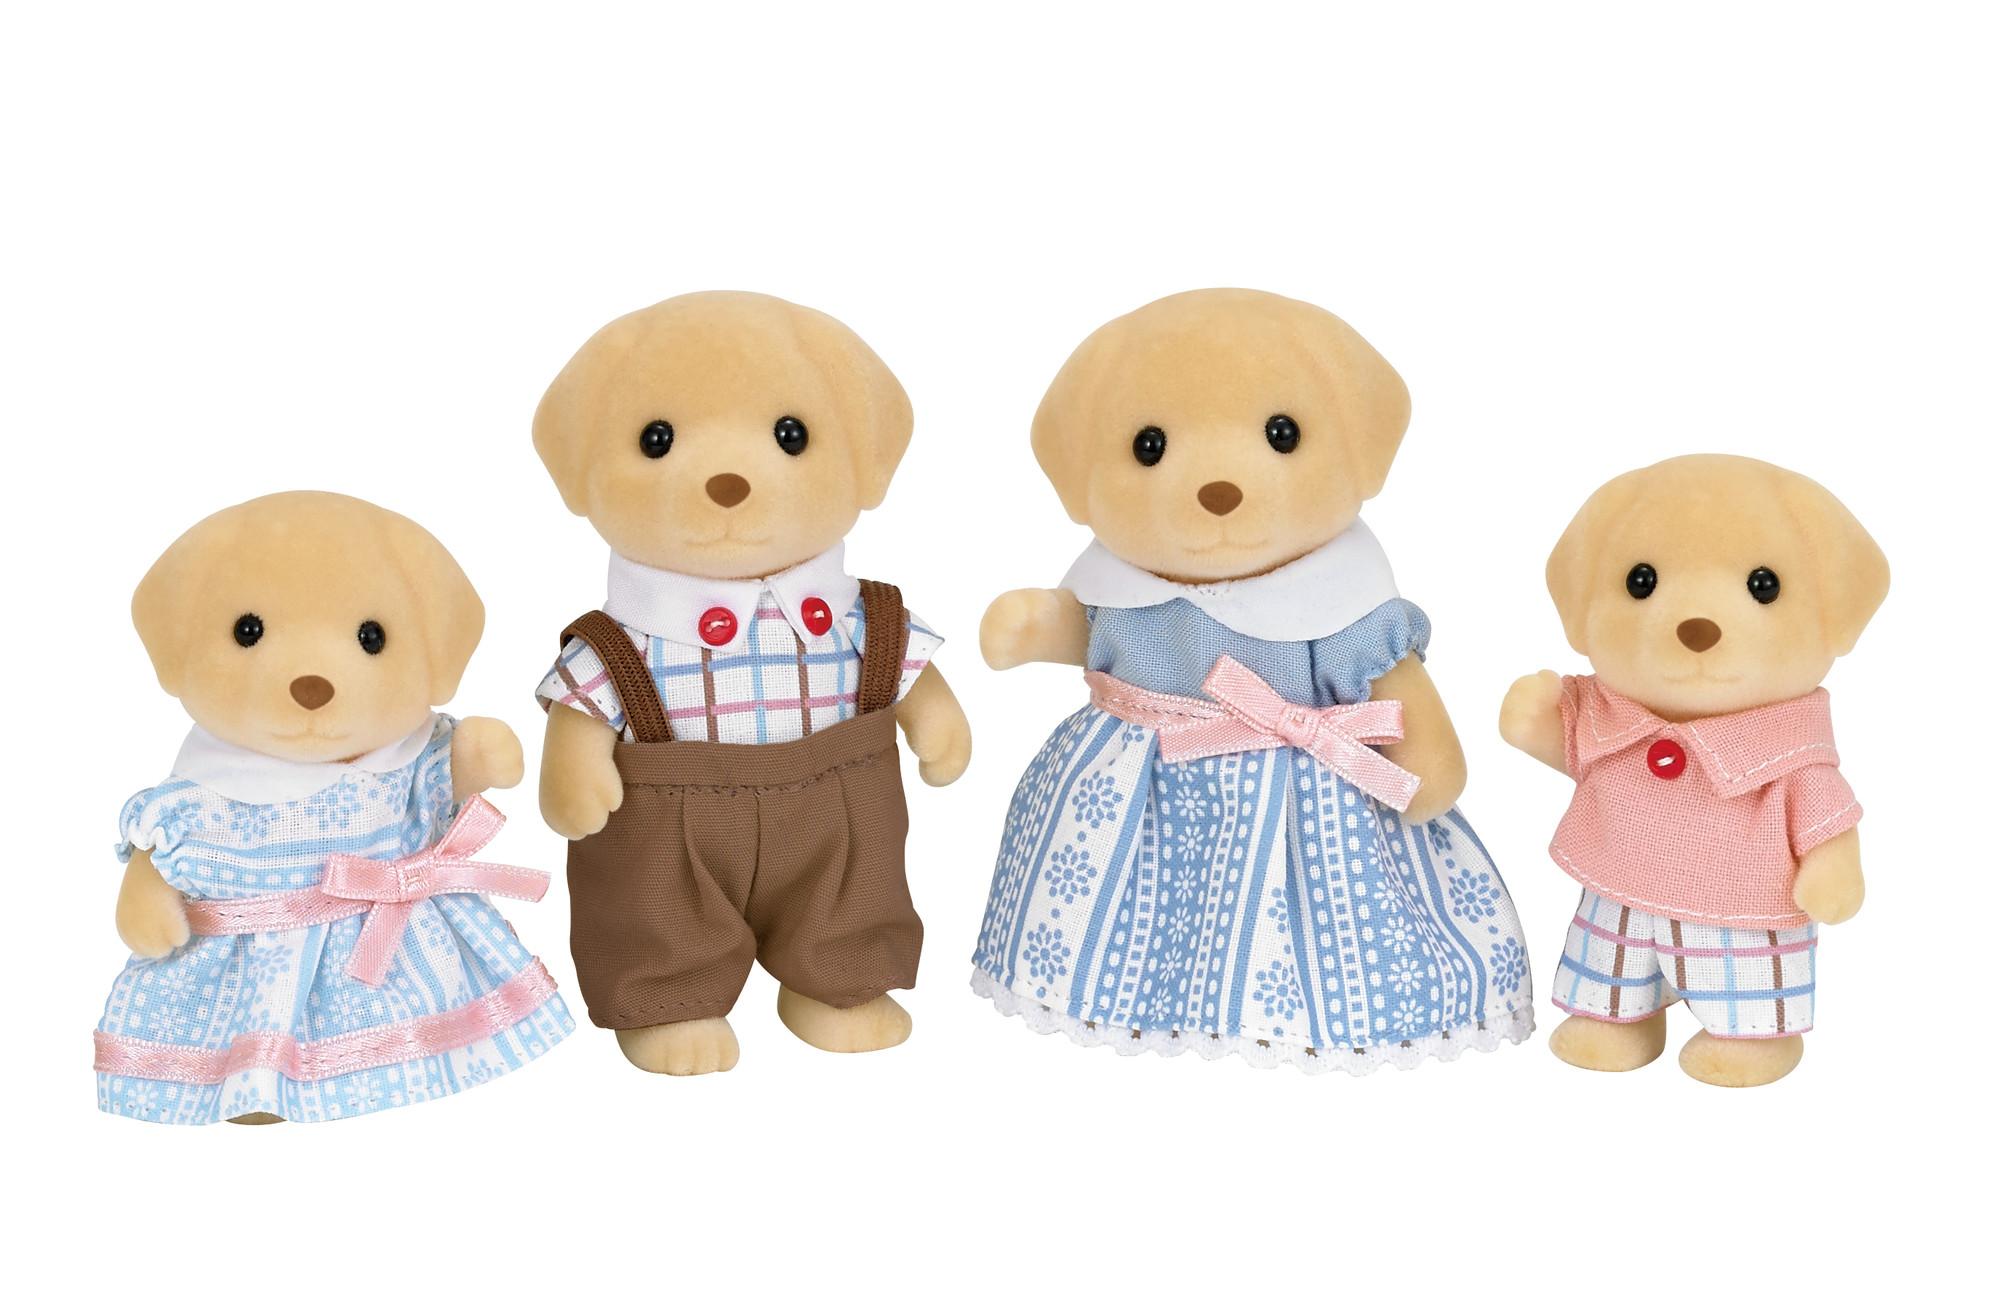 Calico Critters Yellow Labrador Family, Set of 4 Collectible Doll Figures - Walmart.com - Walmart.com $9.99